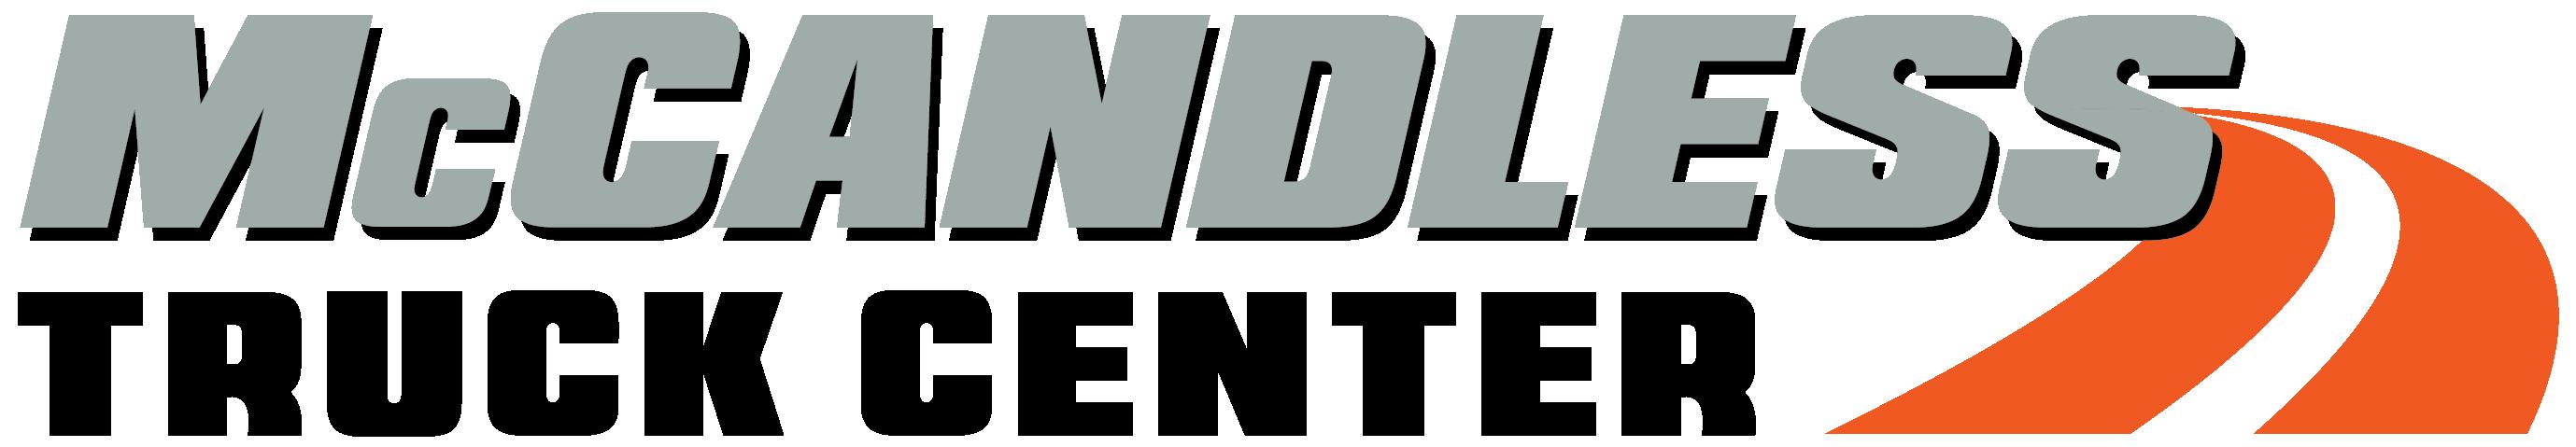 McCandless Truck Center - Aurora logo